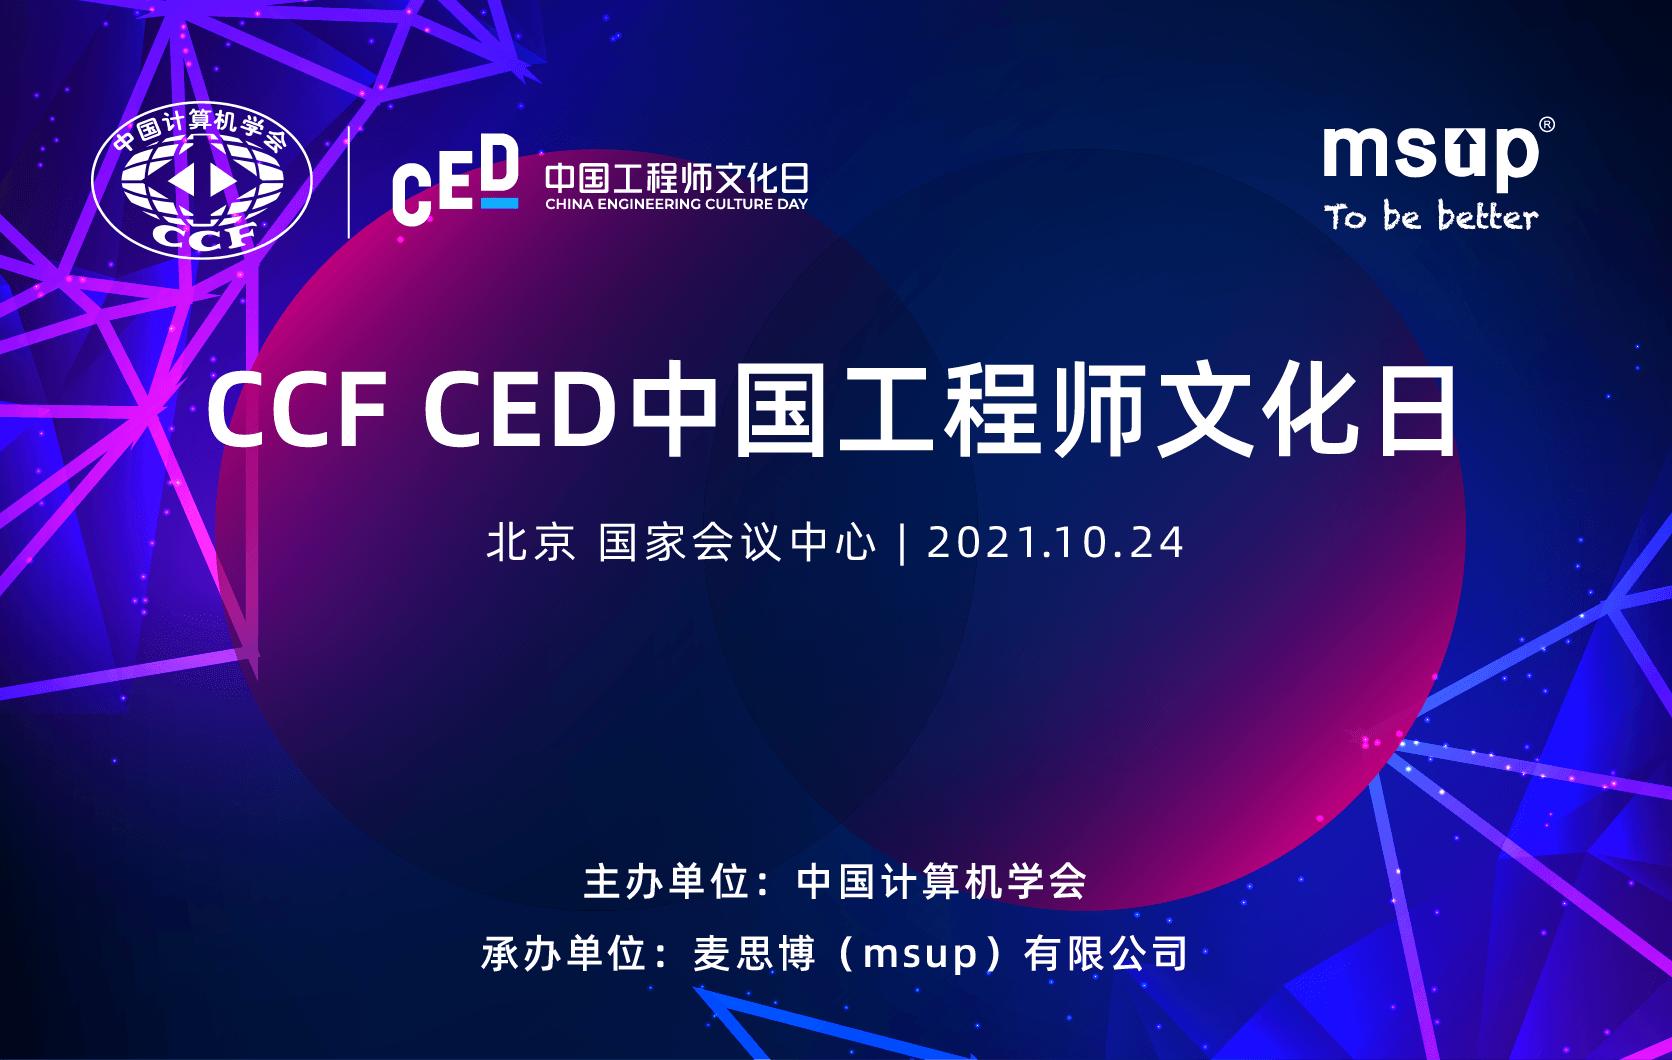 CCF CED中国工程师文化日